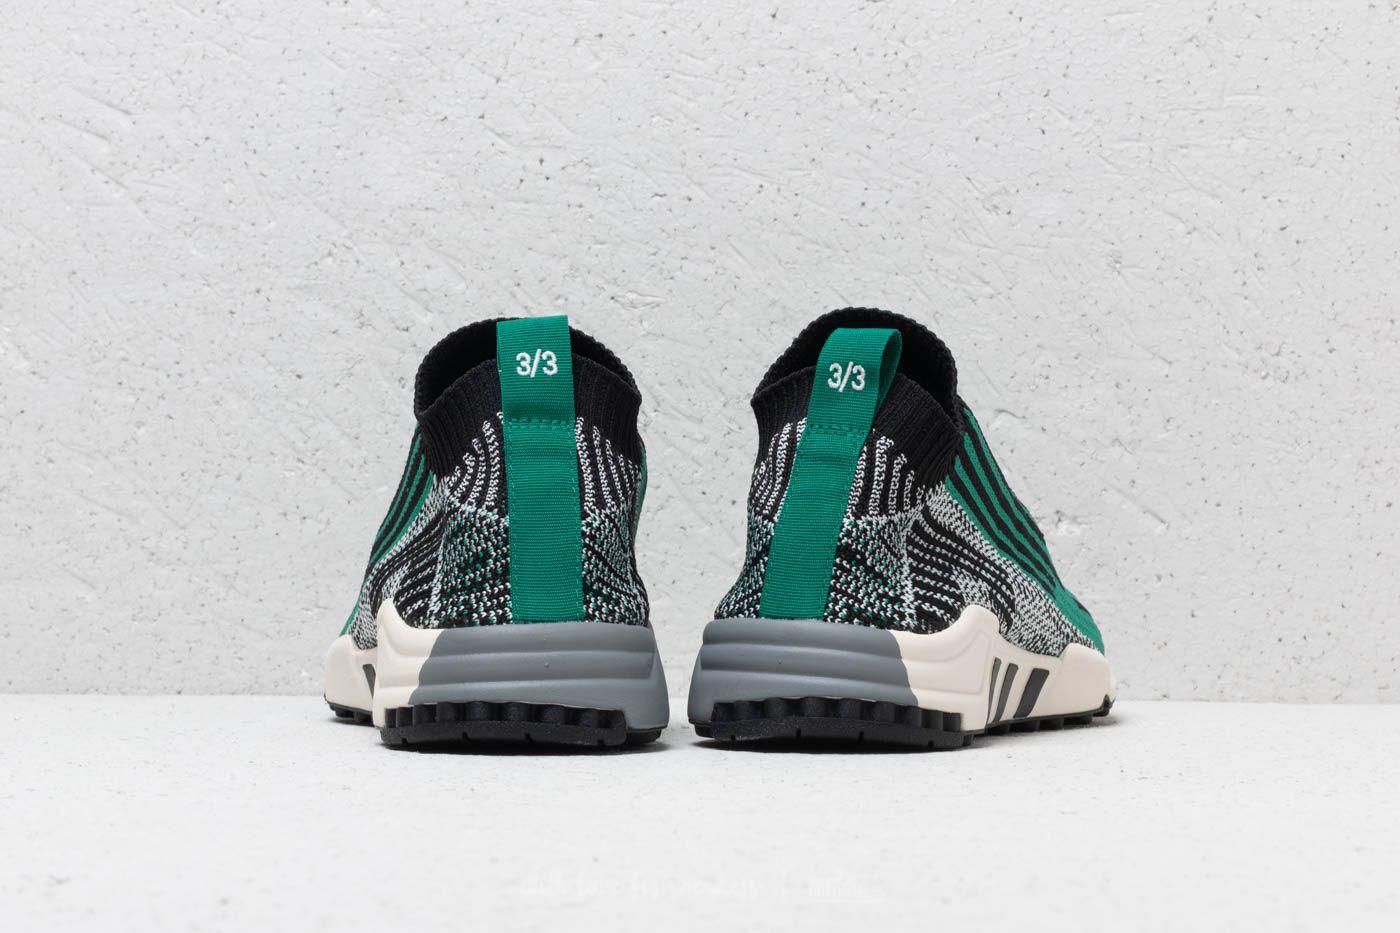 adidas EQT Support SK Primeknit Core Black  Sub Green  Ftw White za skvělou  cenu b229e8a0ca5